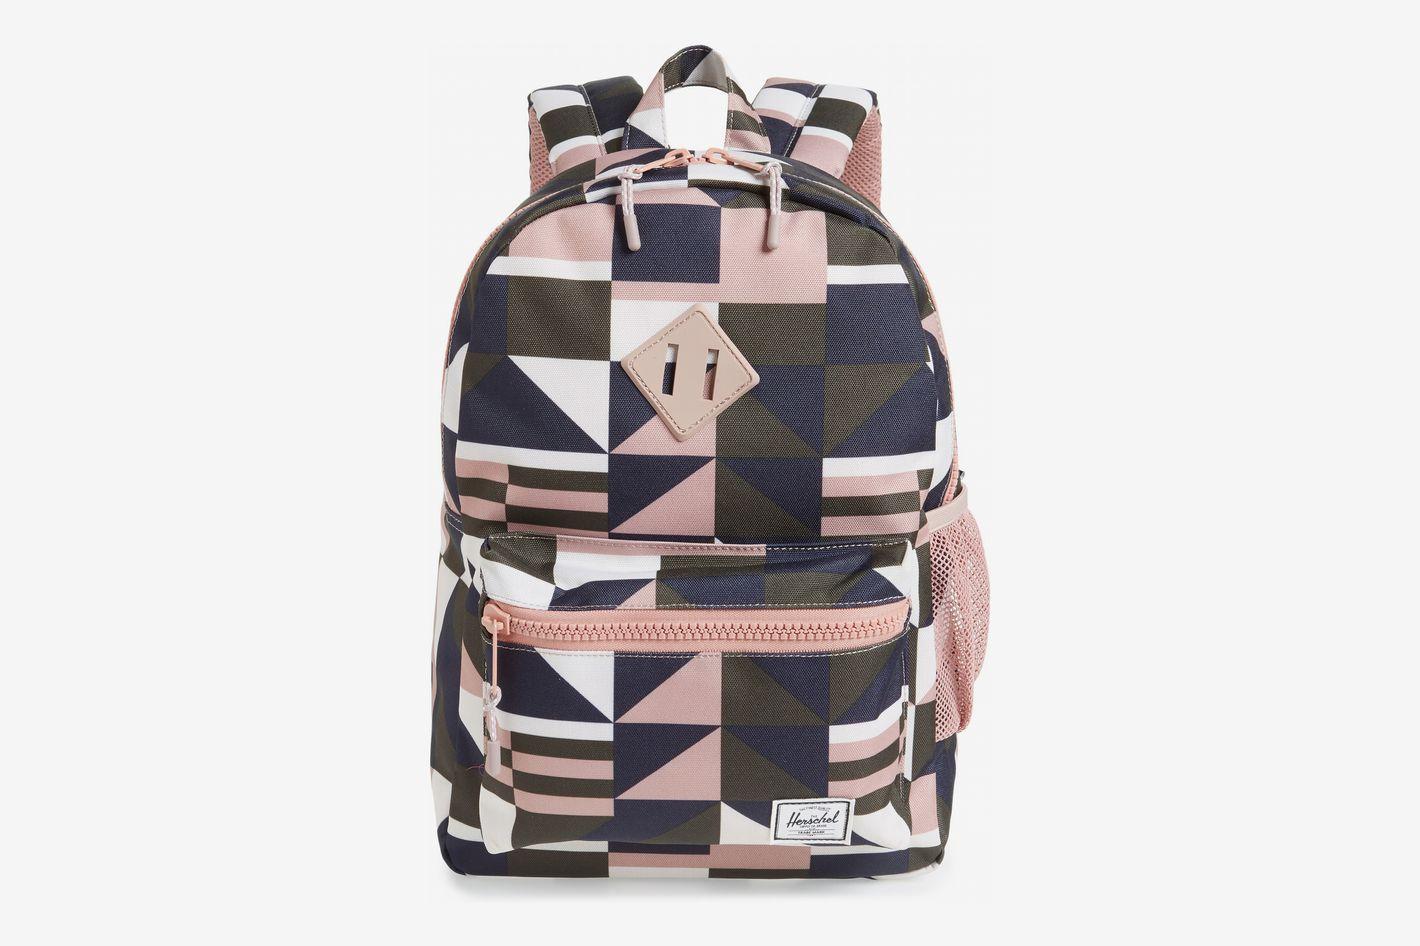 Herschel Extra Large Heritage Backpack